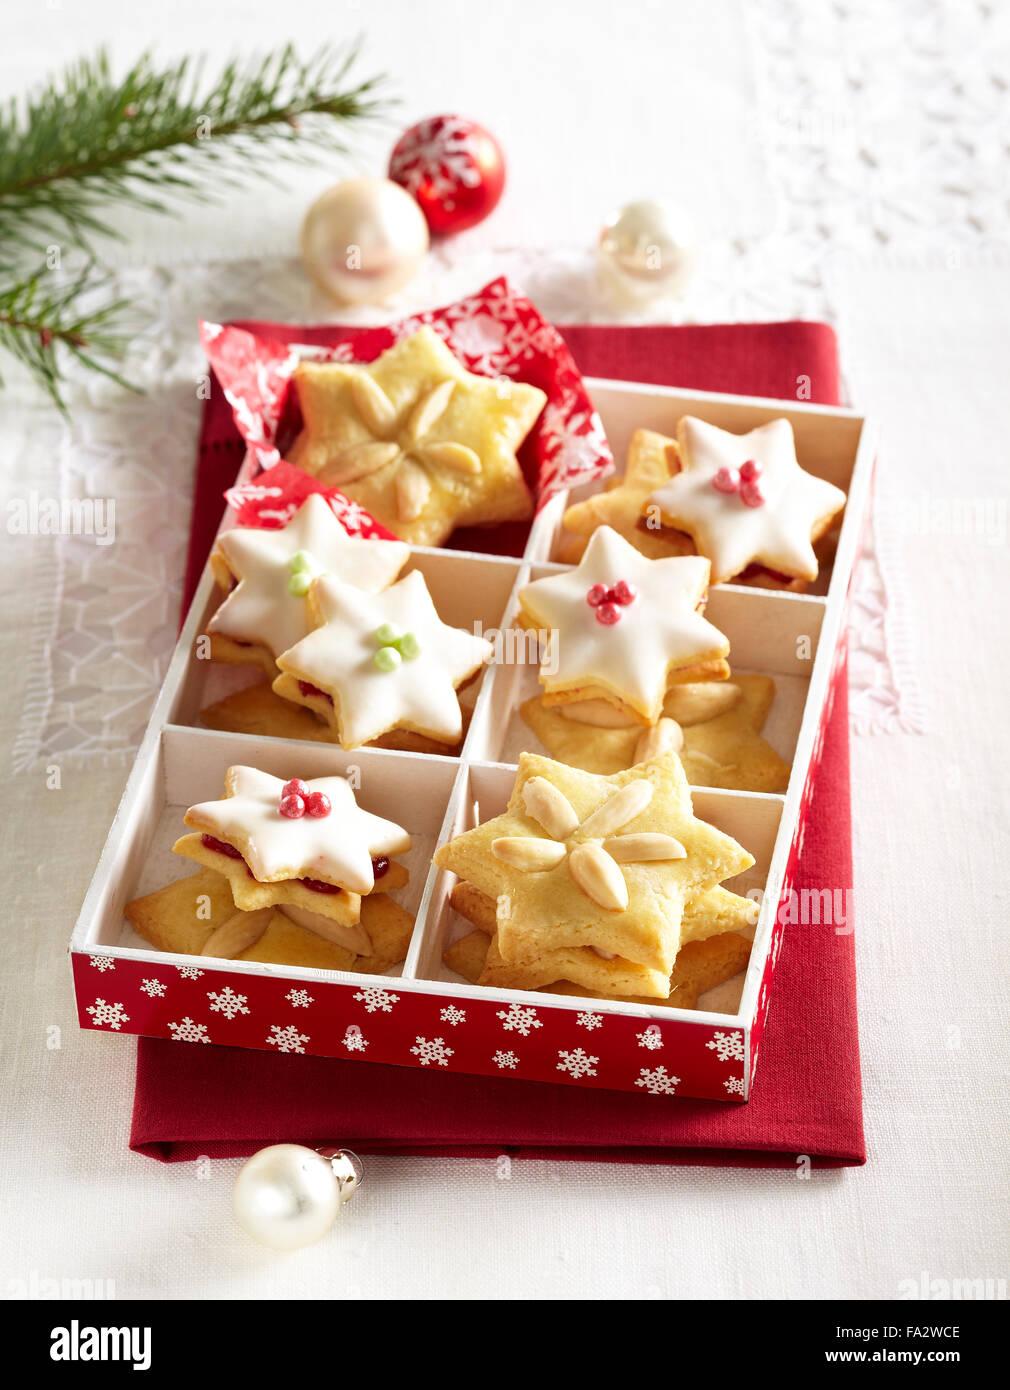 Almond Stars Christmas Cookies Stock Photos Almond Stars Christmas